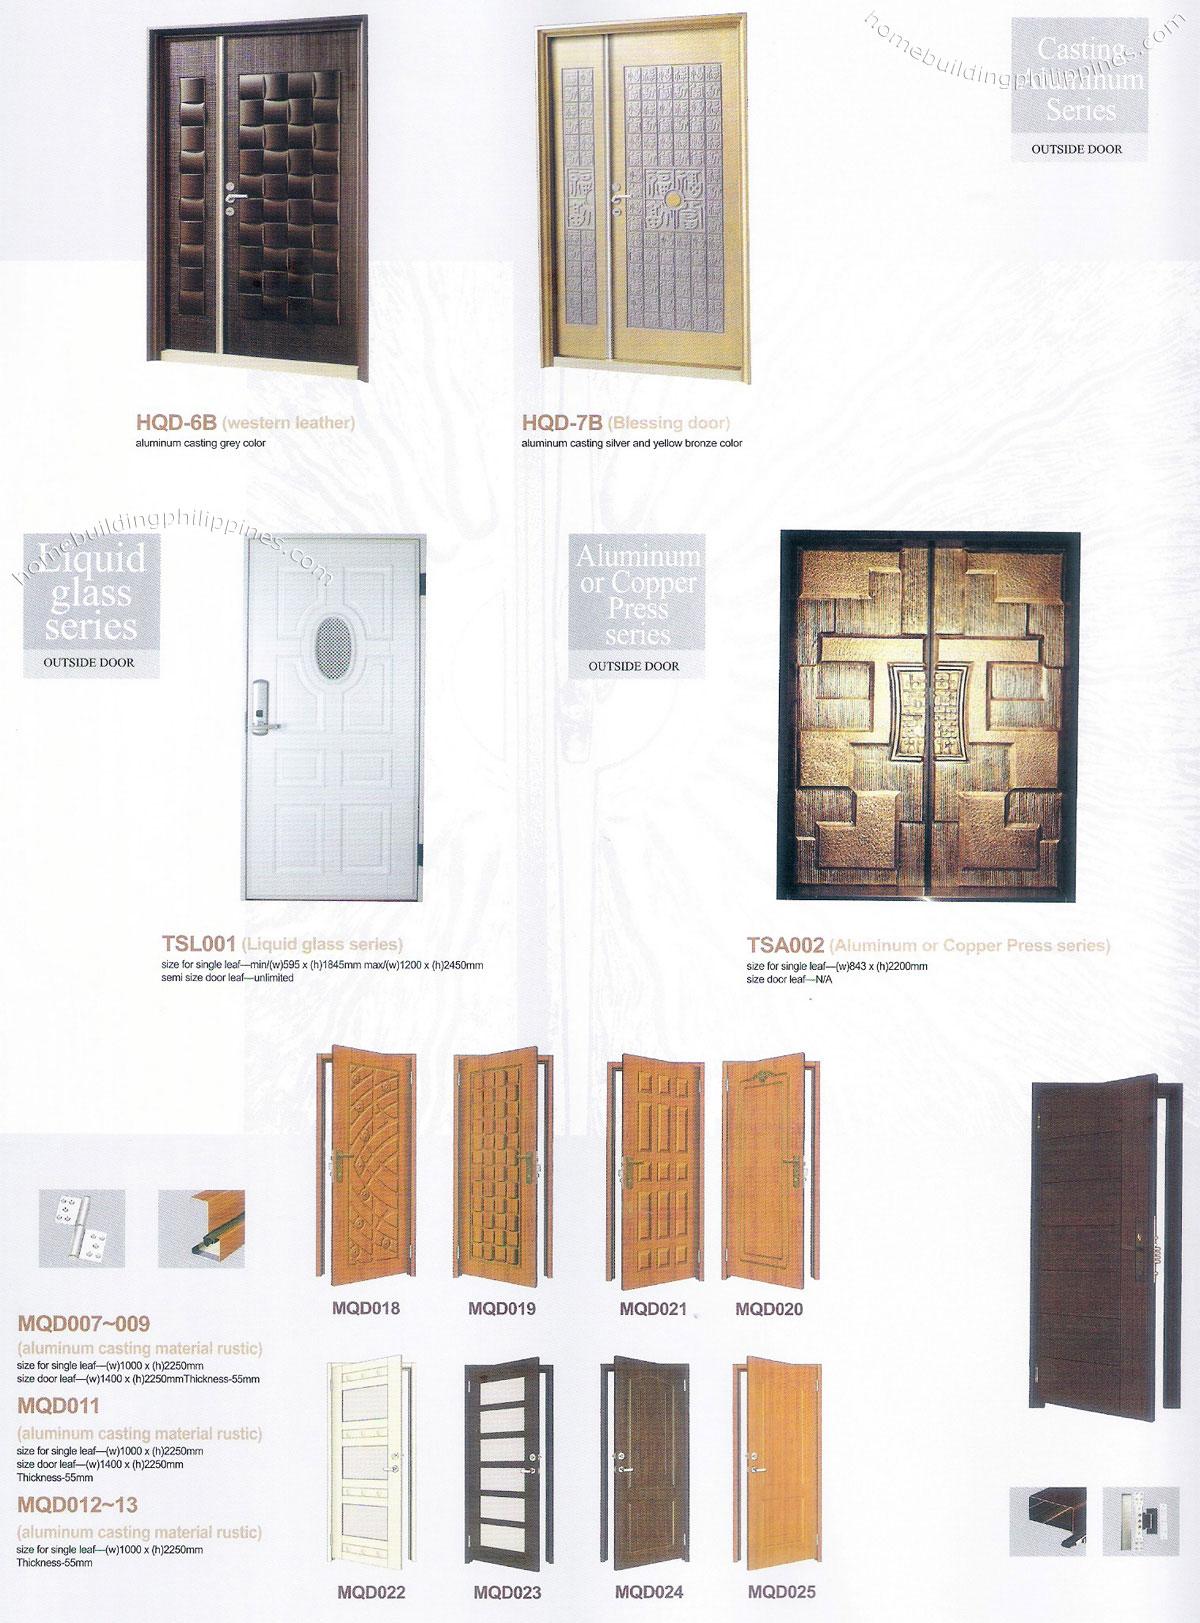 Liquid Glass Door Aluminum Or Copper Press Doors Philippines